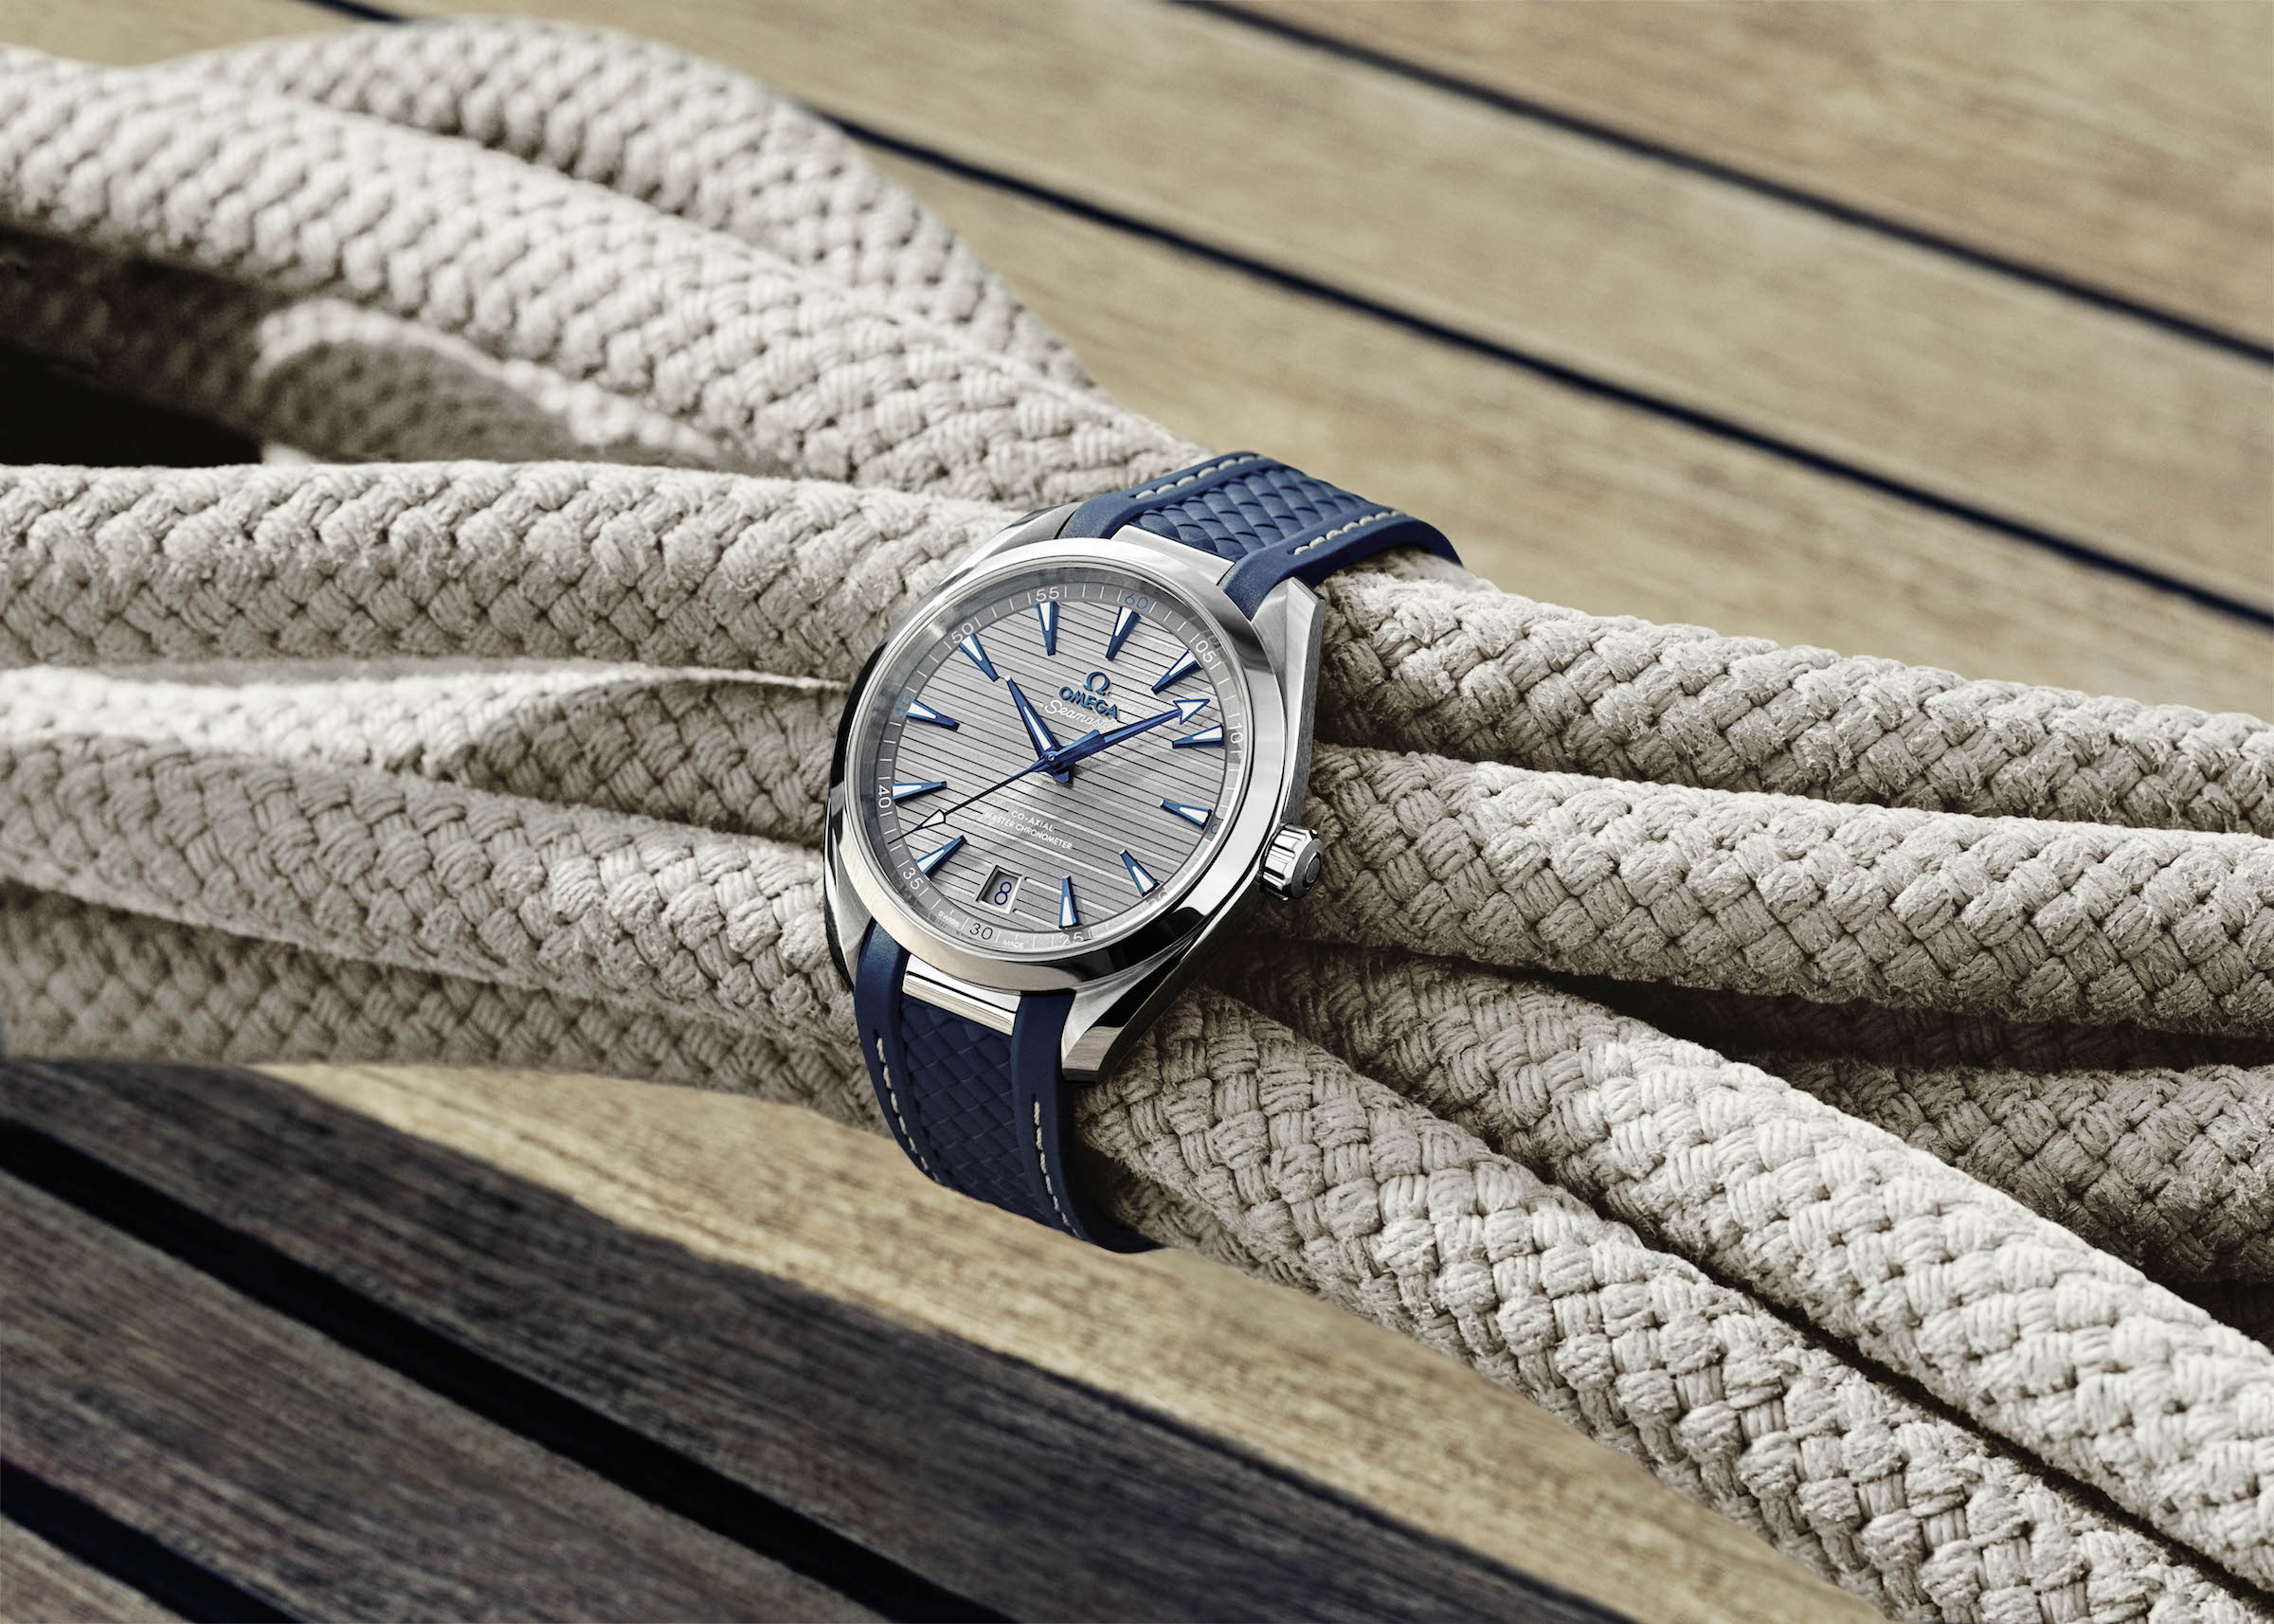 Die Omega Seamaster Aqua Terra 150M